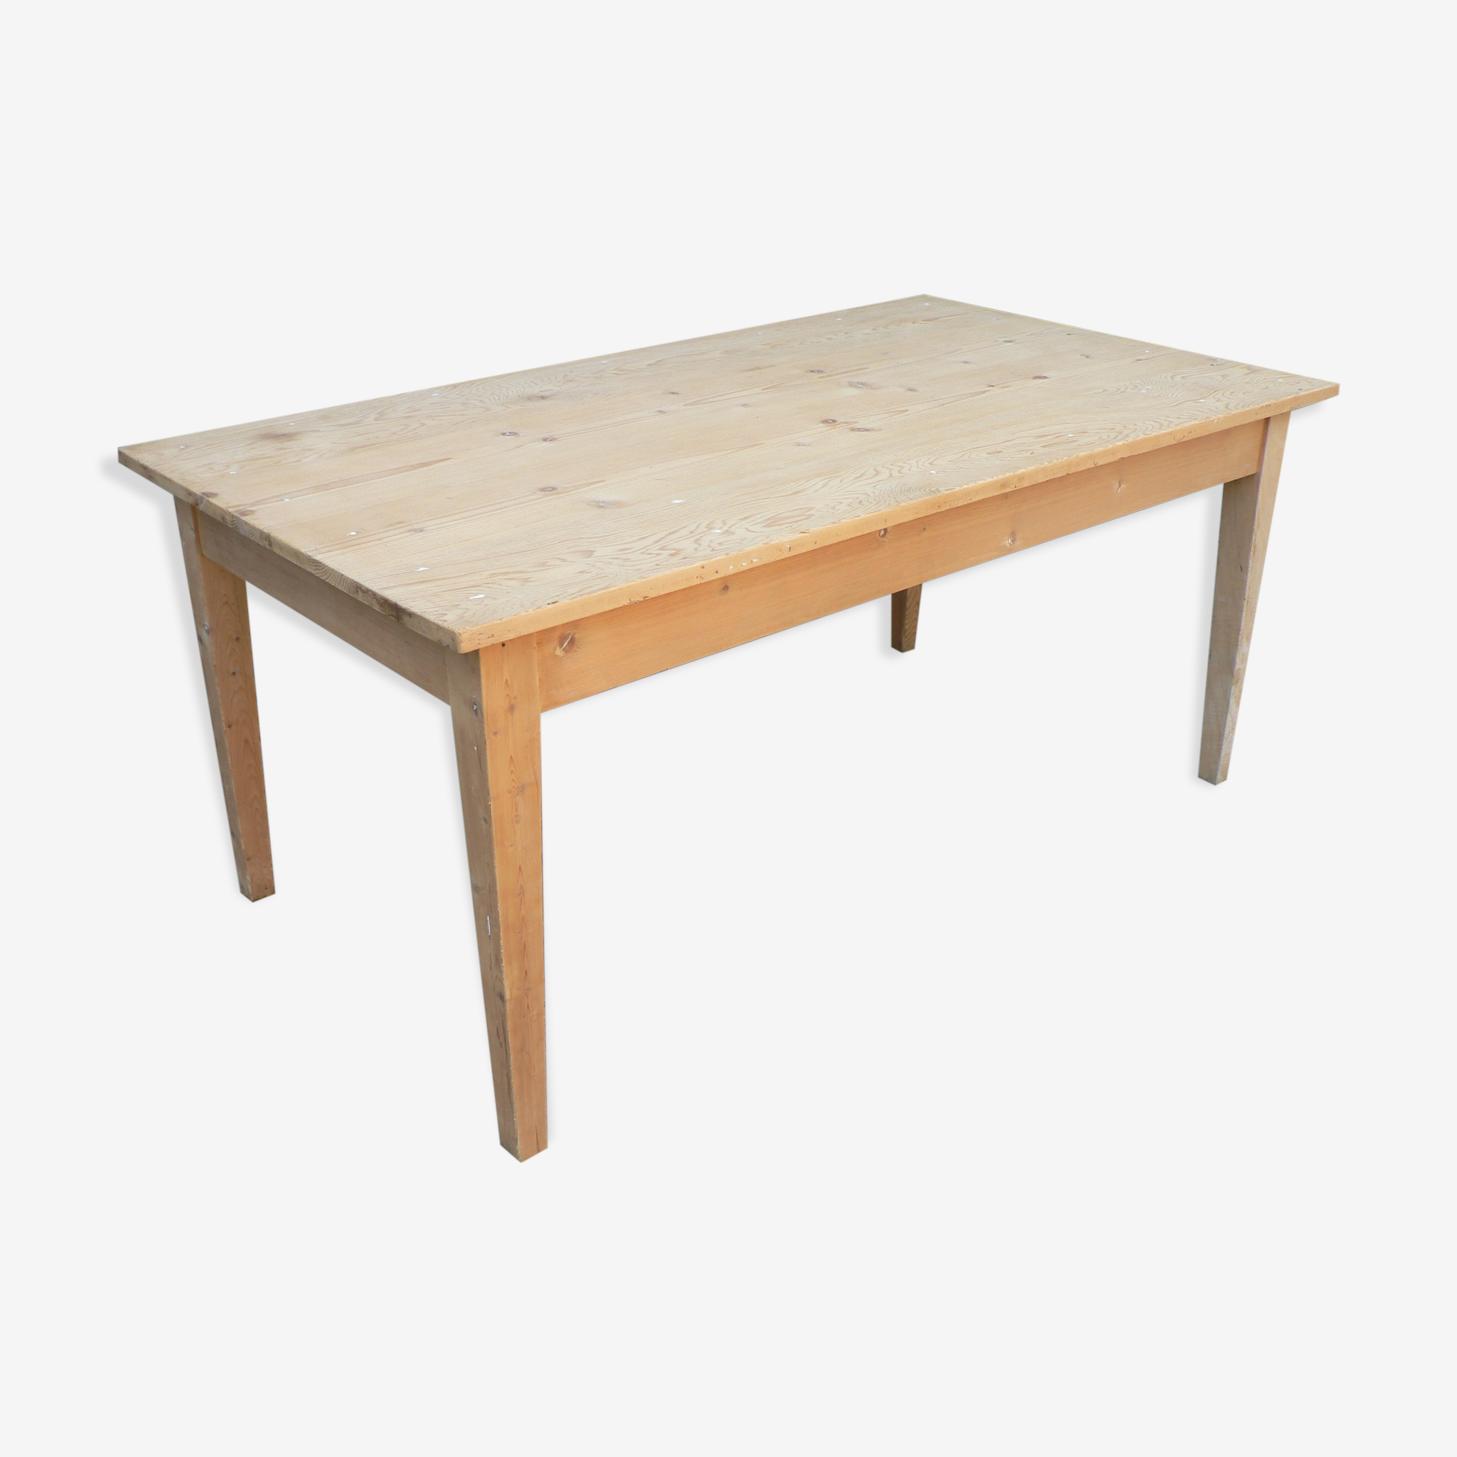 Farm table pickled 160cm